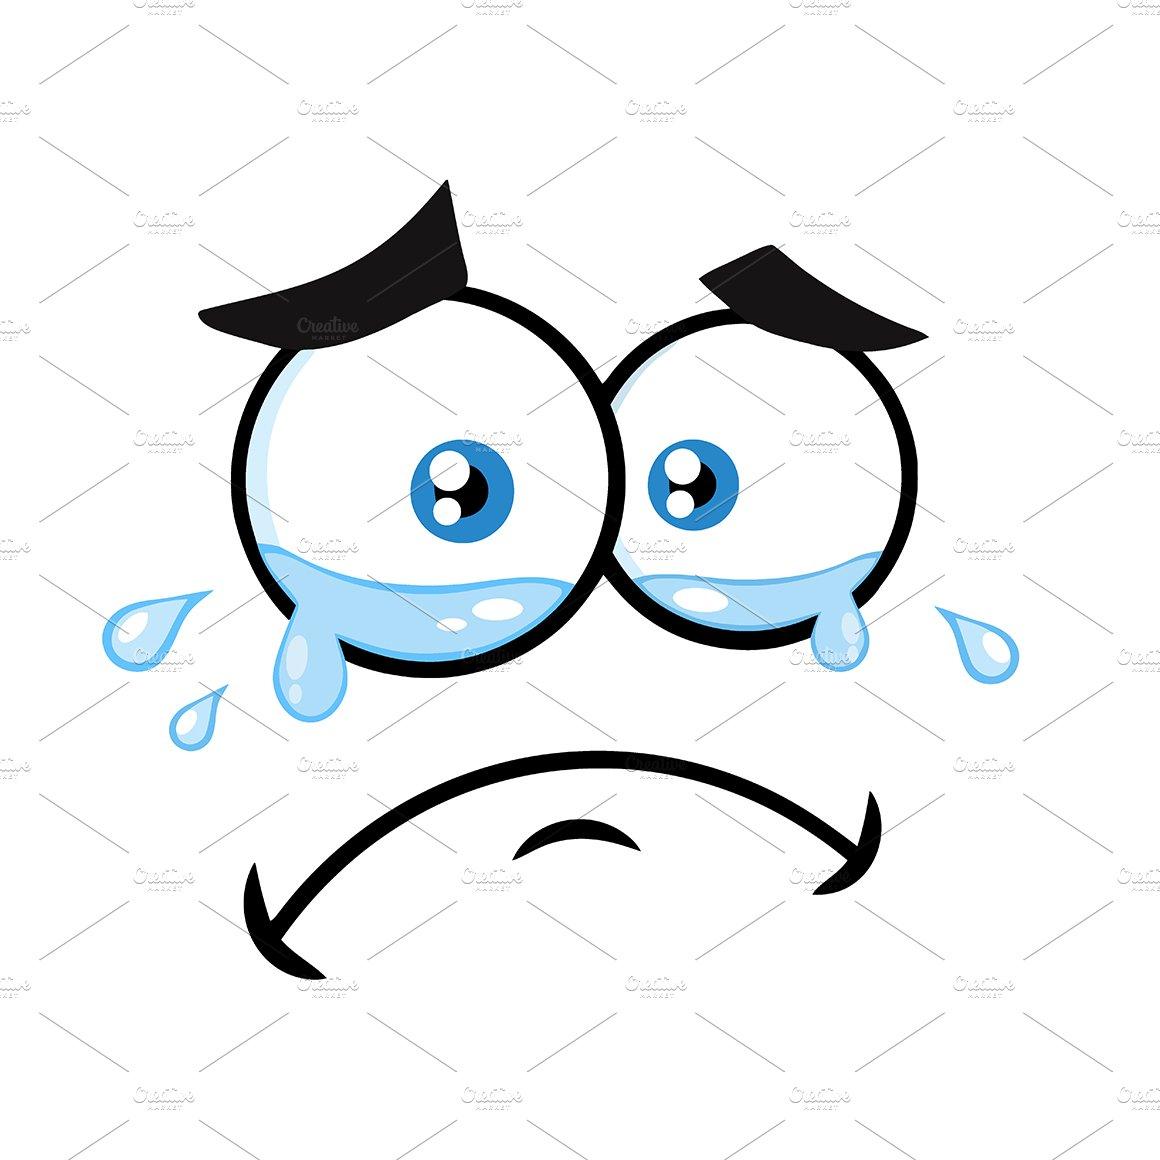 I'm Sick 🤒 CRY BABIES MAGIC TEARS 💕 - YouTube